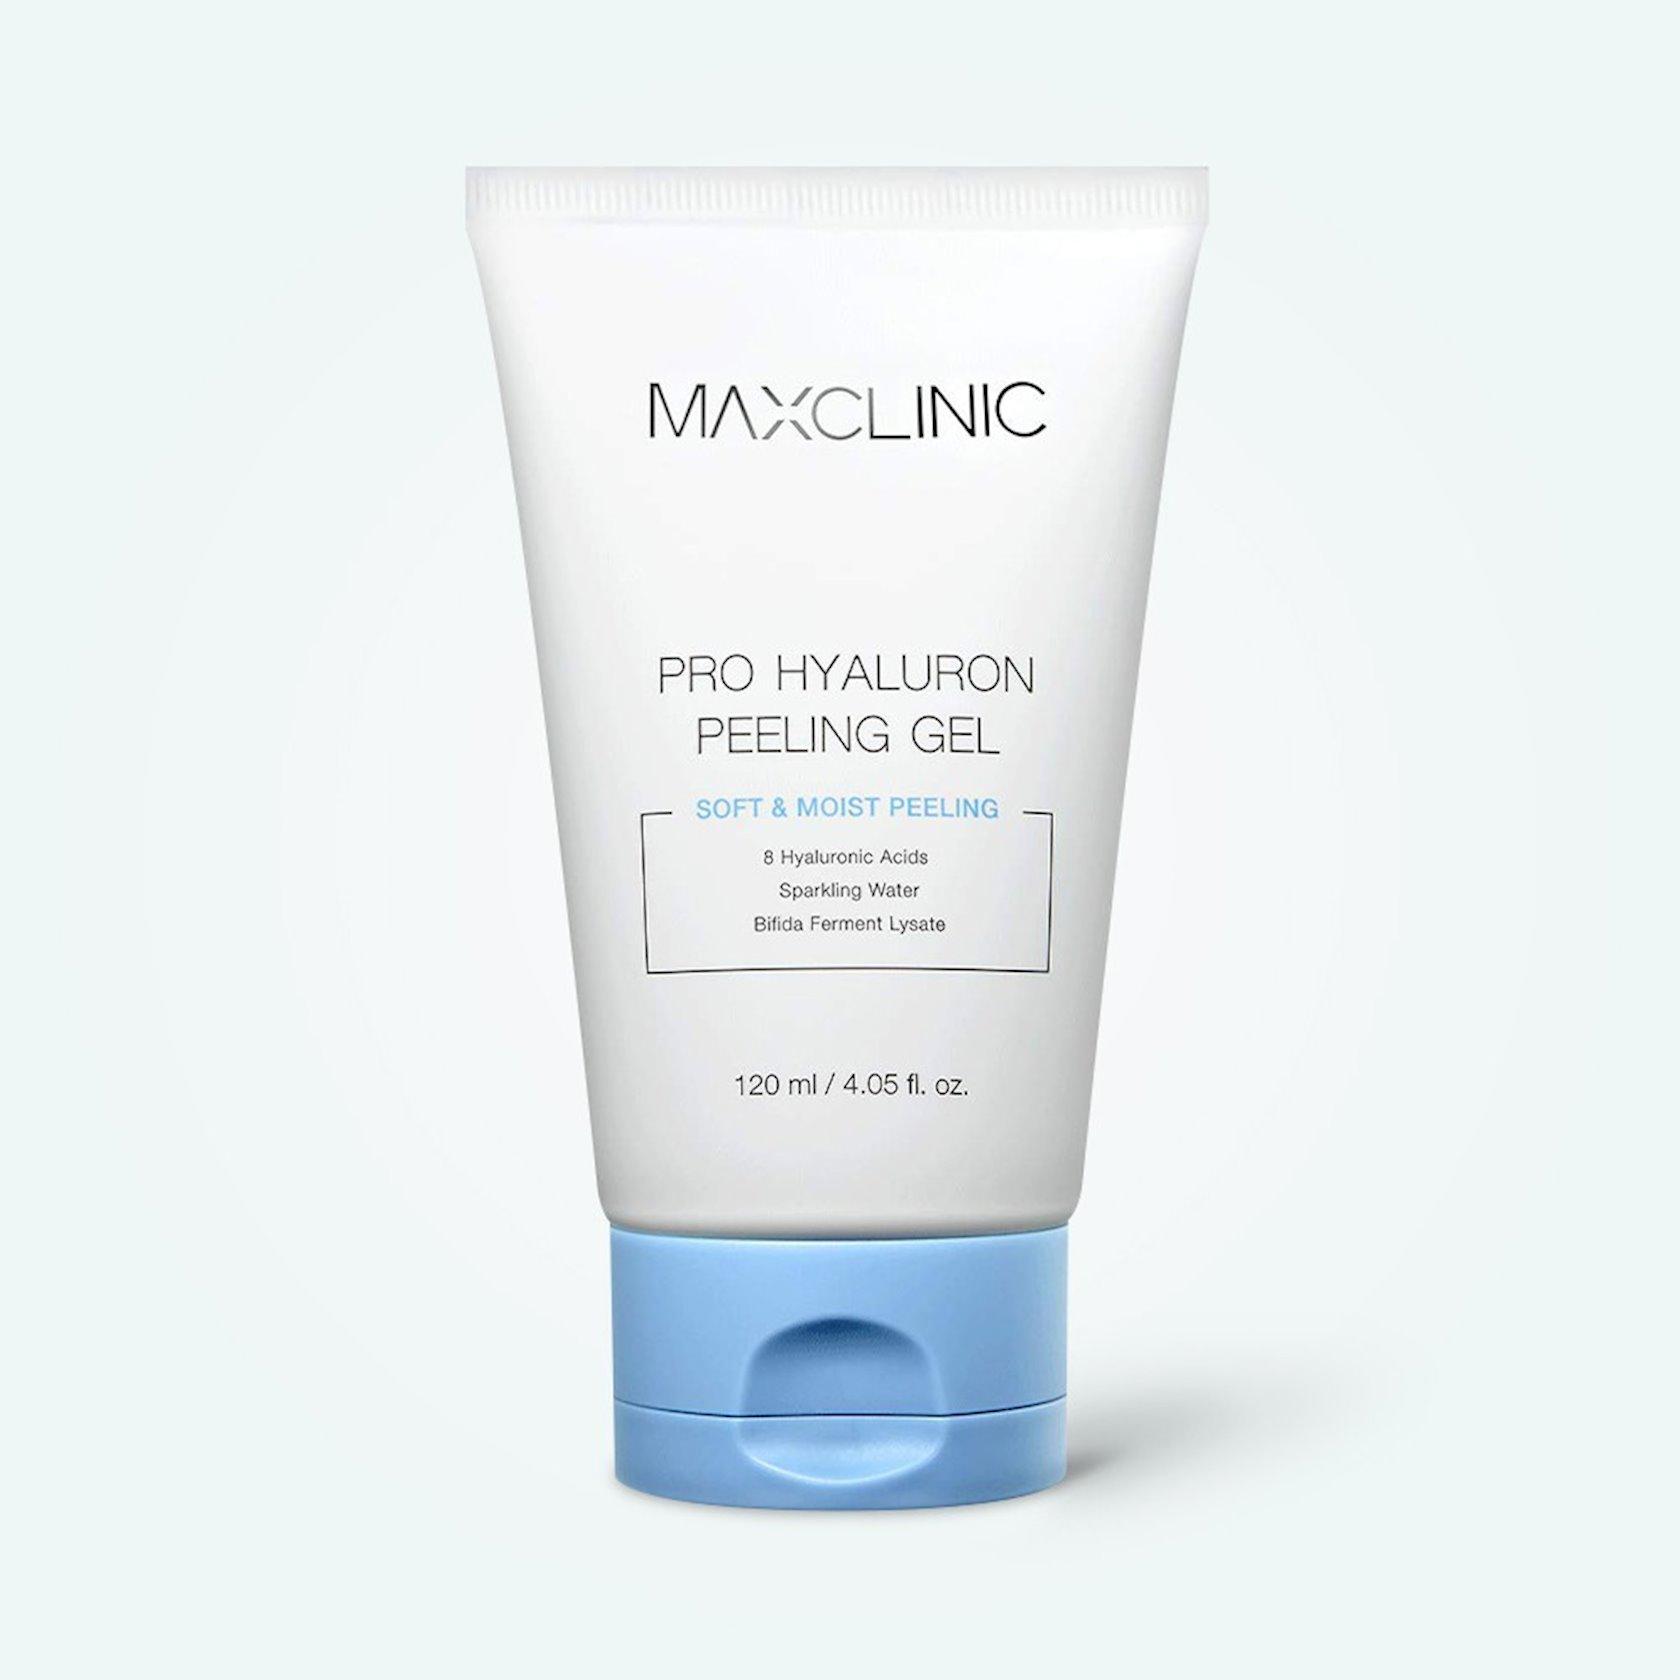 Pilinq-gel hialuron turşusu ilə Maxclinic Pro Hyaluron Peeling Gel 120 ml